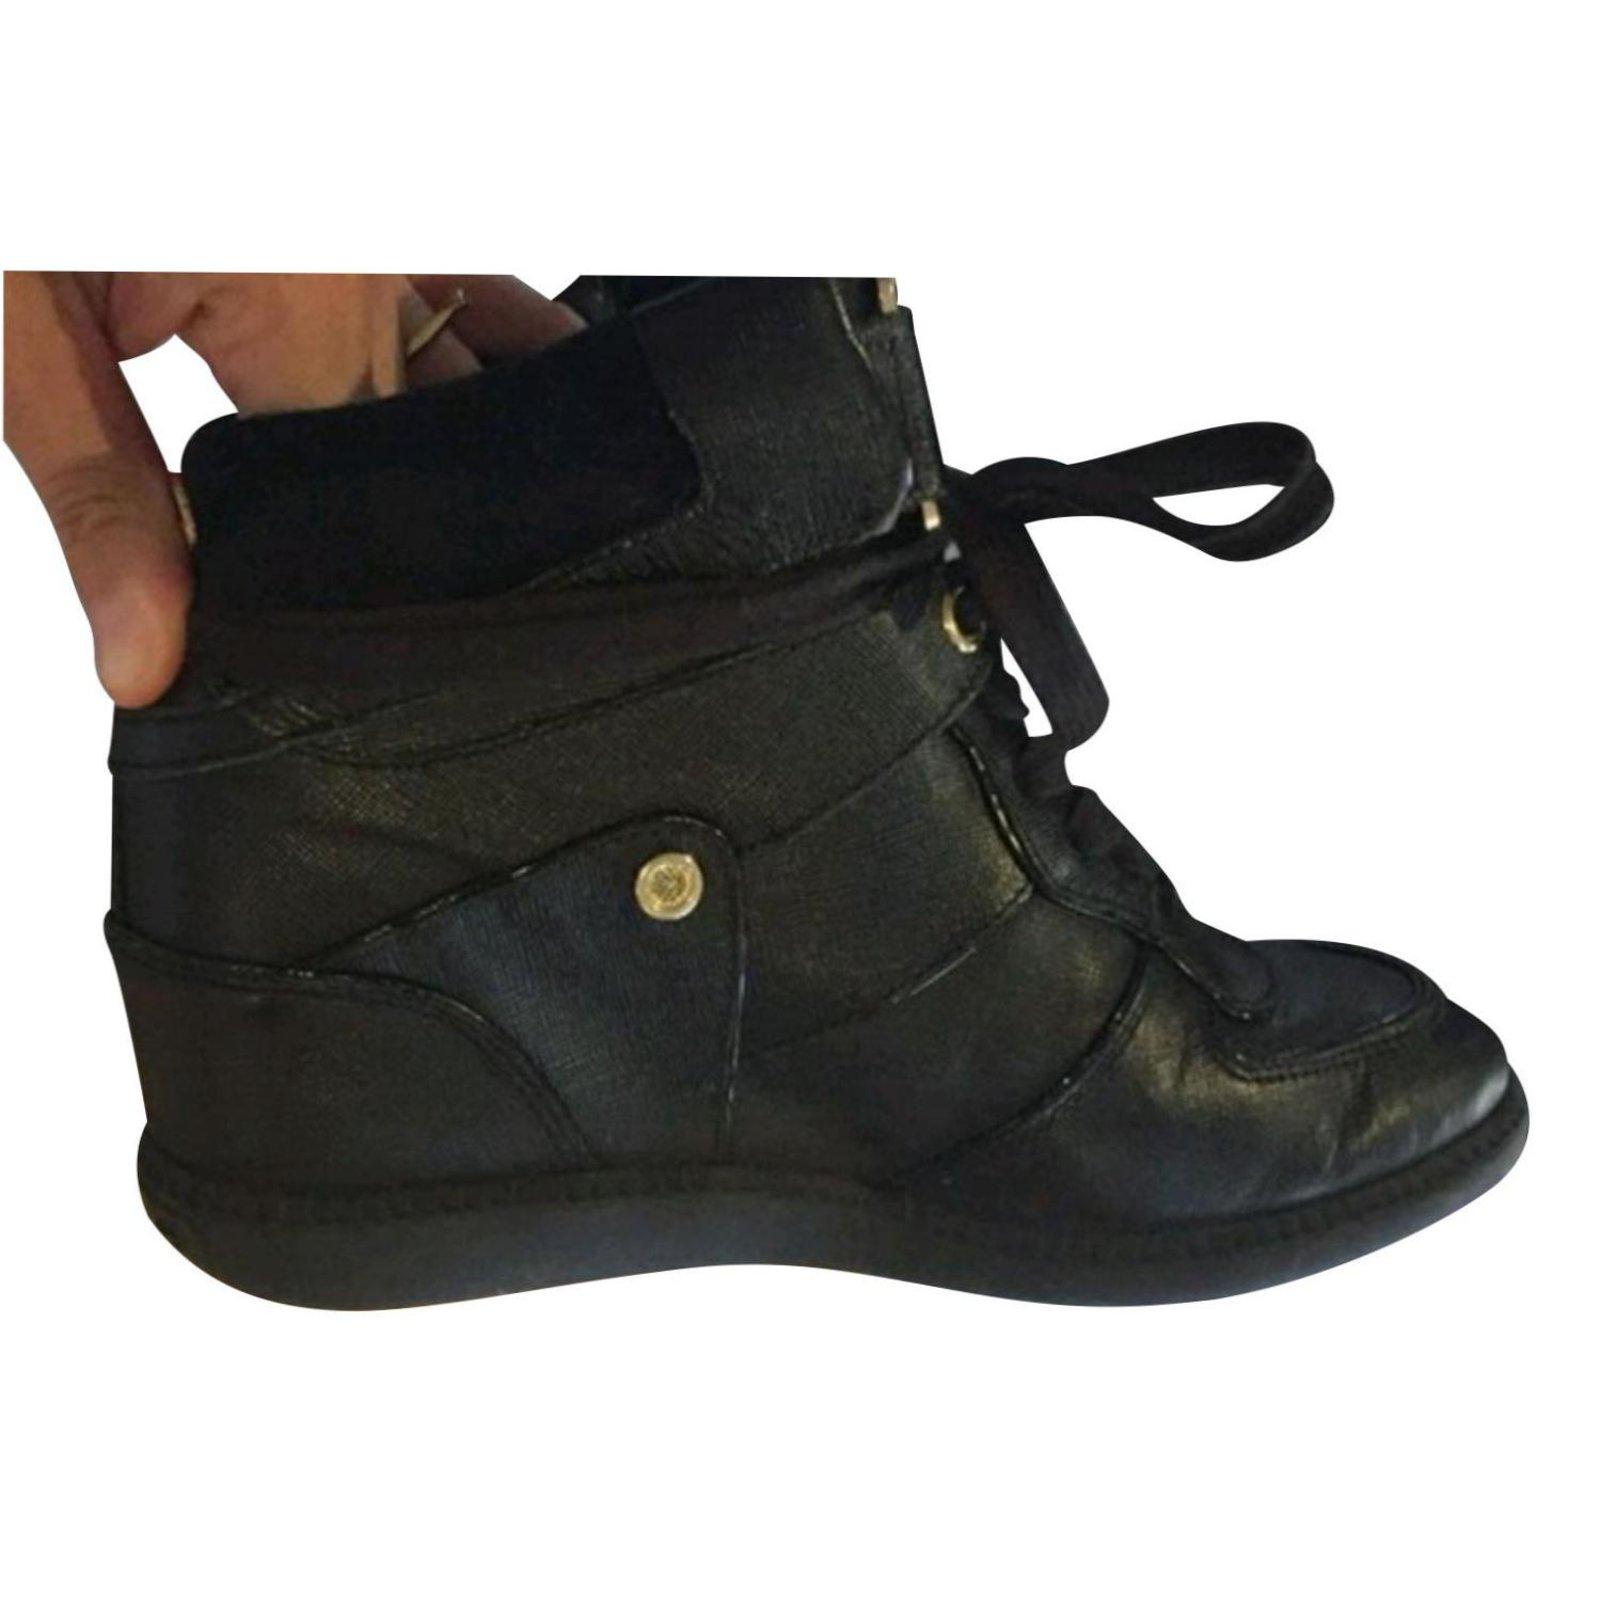 Michael Kors Sneakers Sneakers Other